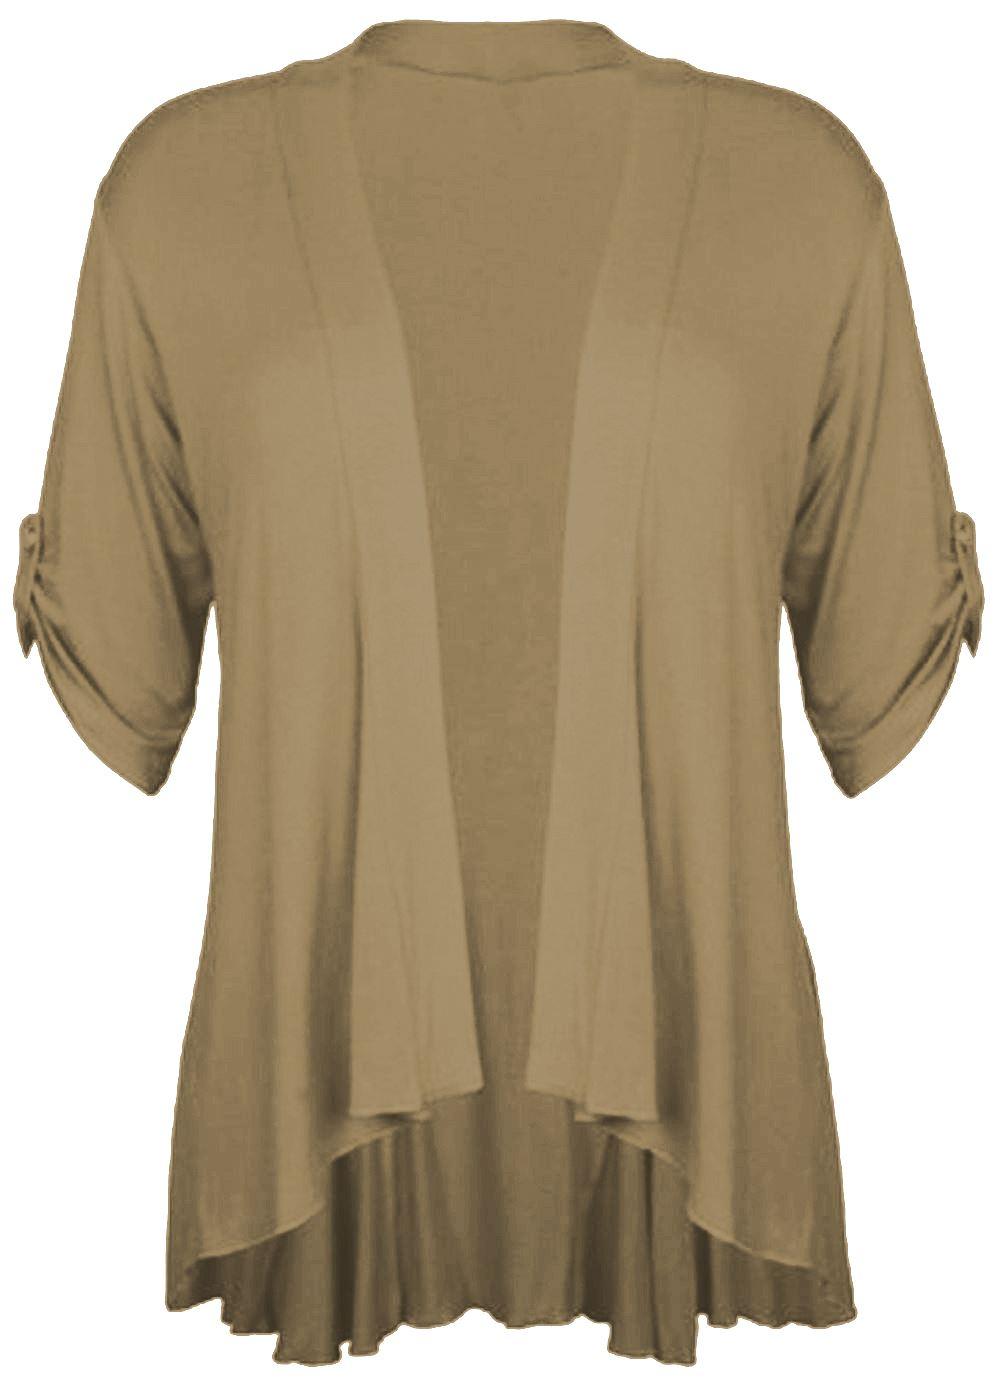 Ladies plus Size Turn Up Sleeve Waterfall Cardigan 3/4 Sleeve ...